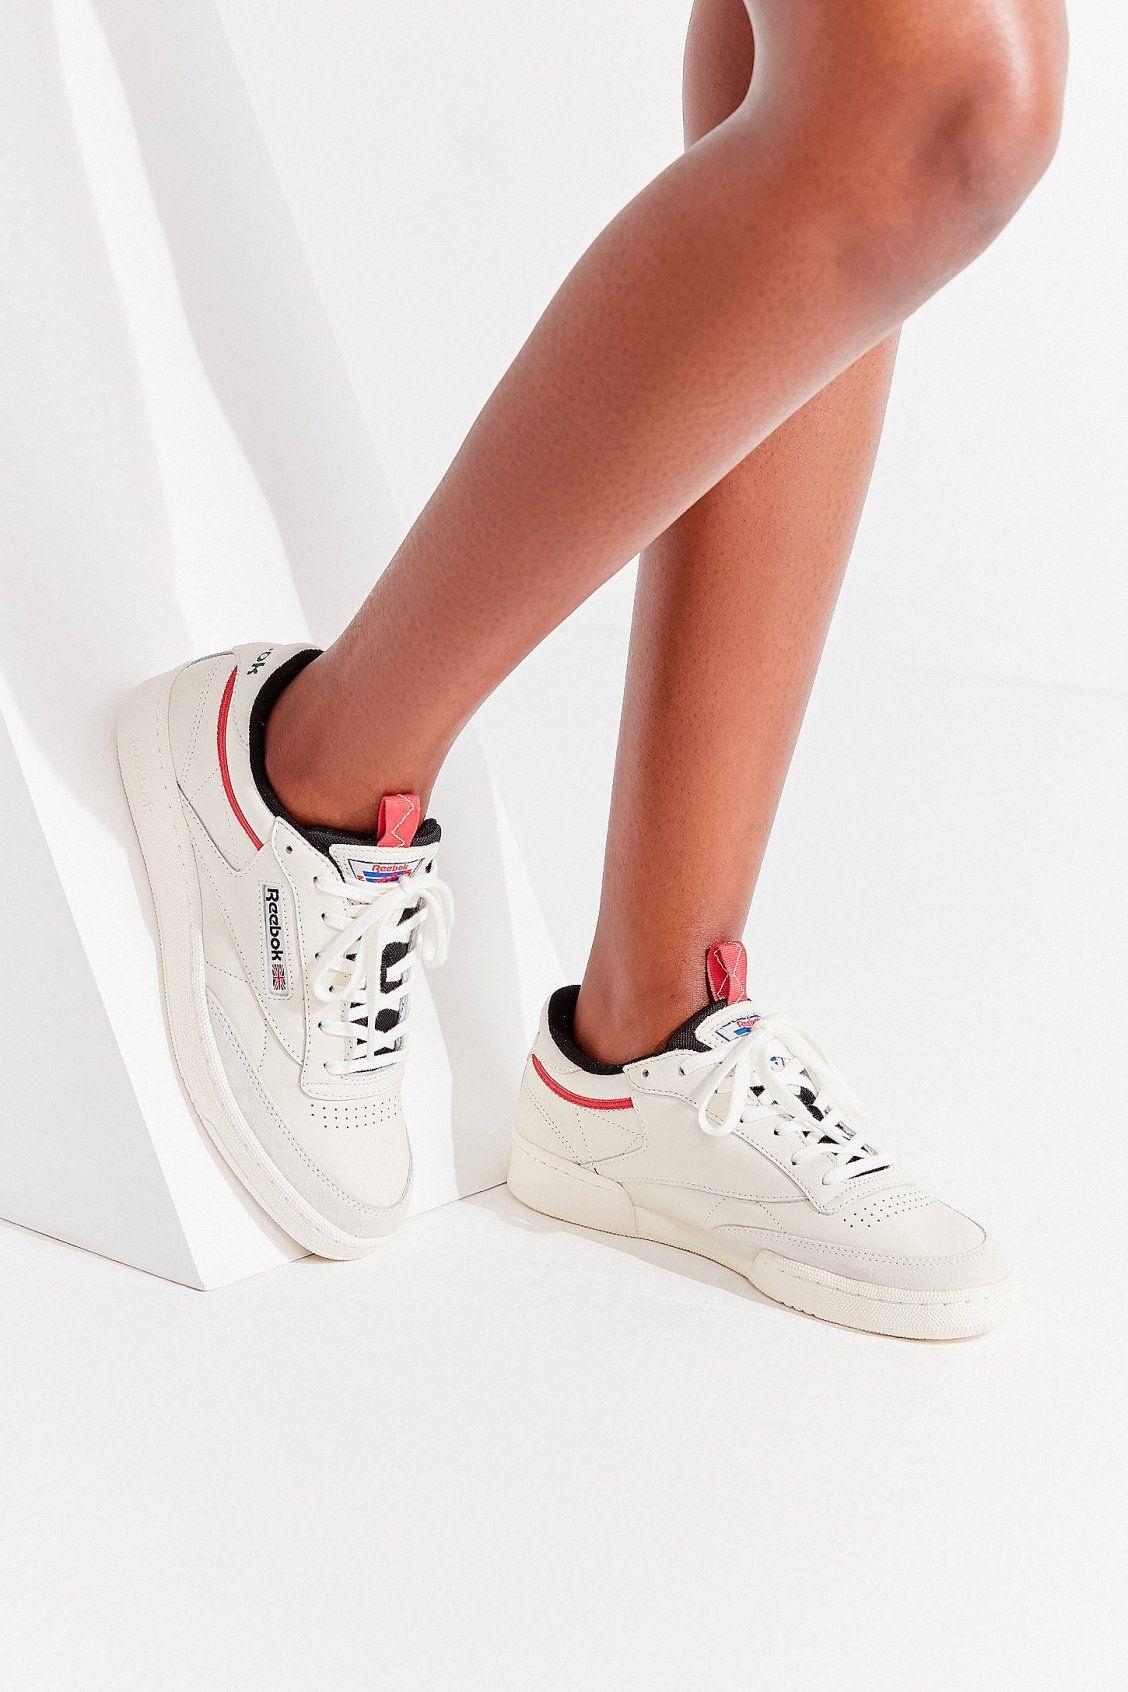 Reebok Club C 85 Rad Sneaker Leather Shoes Woman Womens Fashion Shoes Sneakers